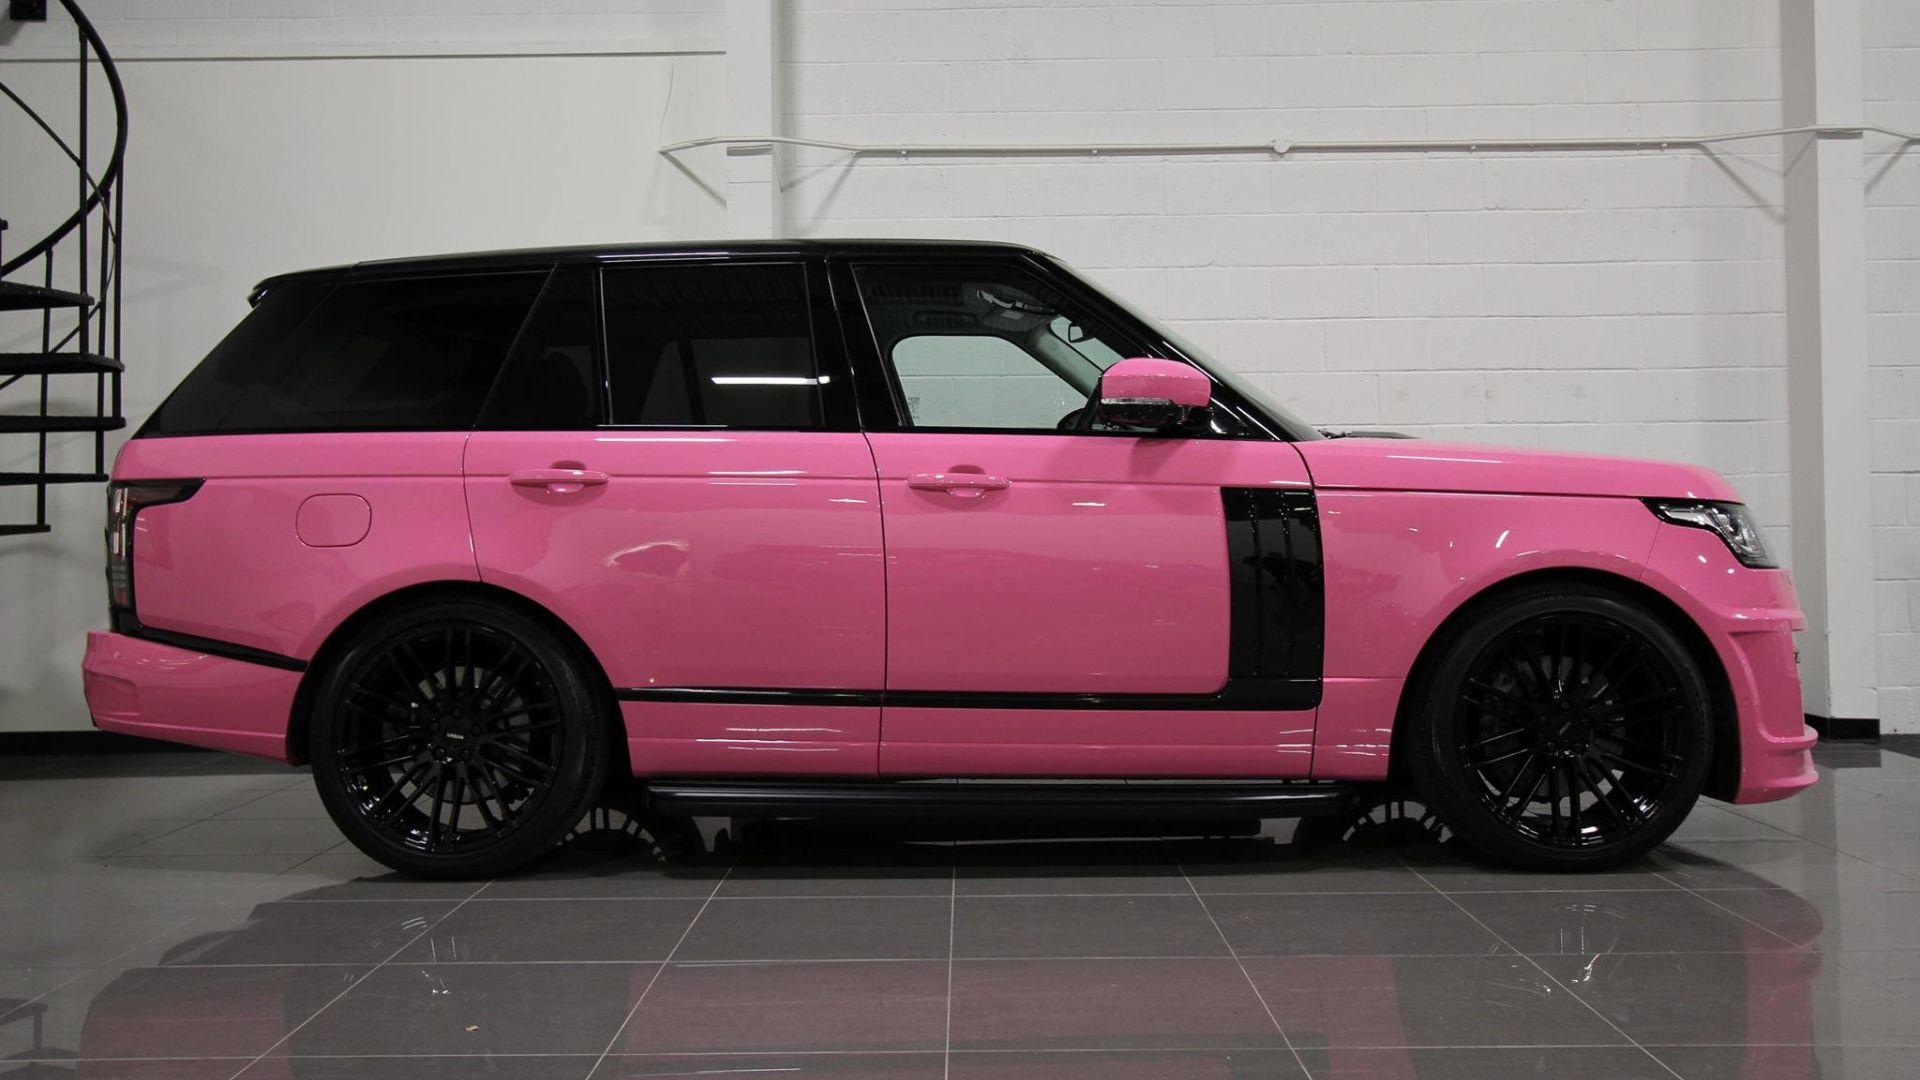 Katie Price pink Range Rover for sale